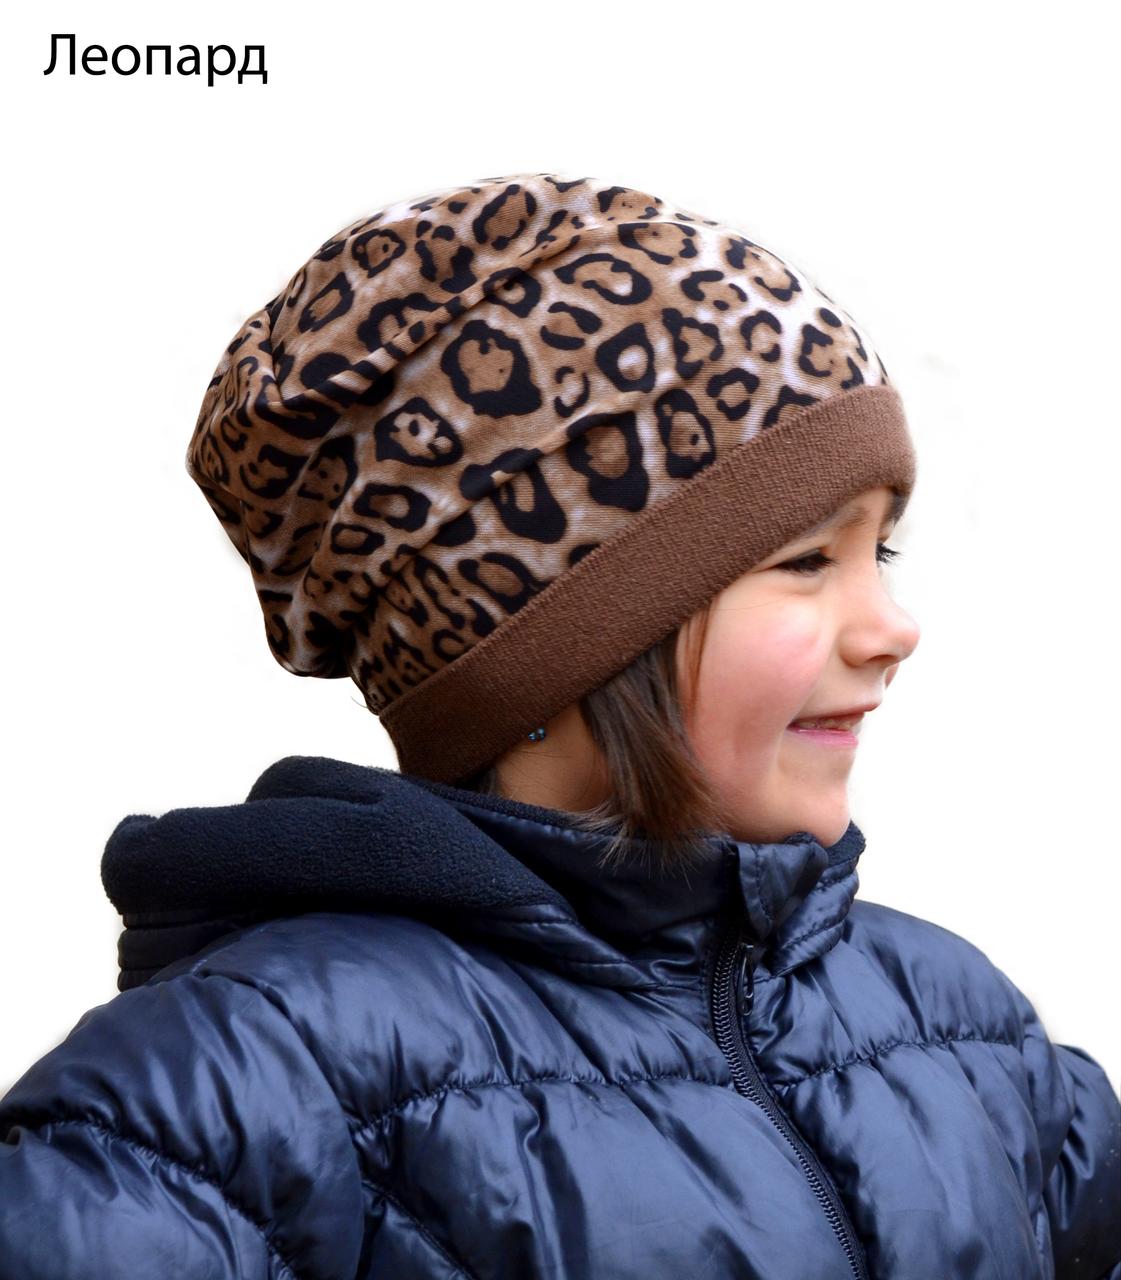 №134 Акция! Детская шапочка Фантазия, хлопок 60%. от 3 лет. р.50-52 т.синий, р. 53-55 и р.54-57 леопард